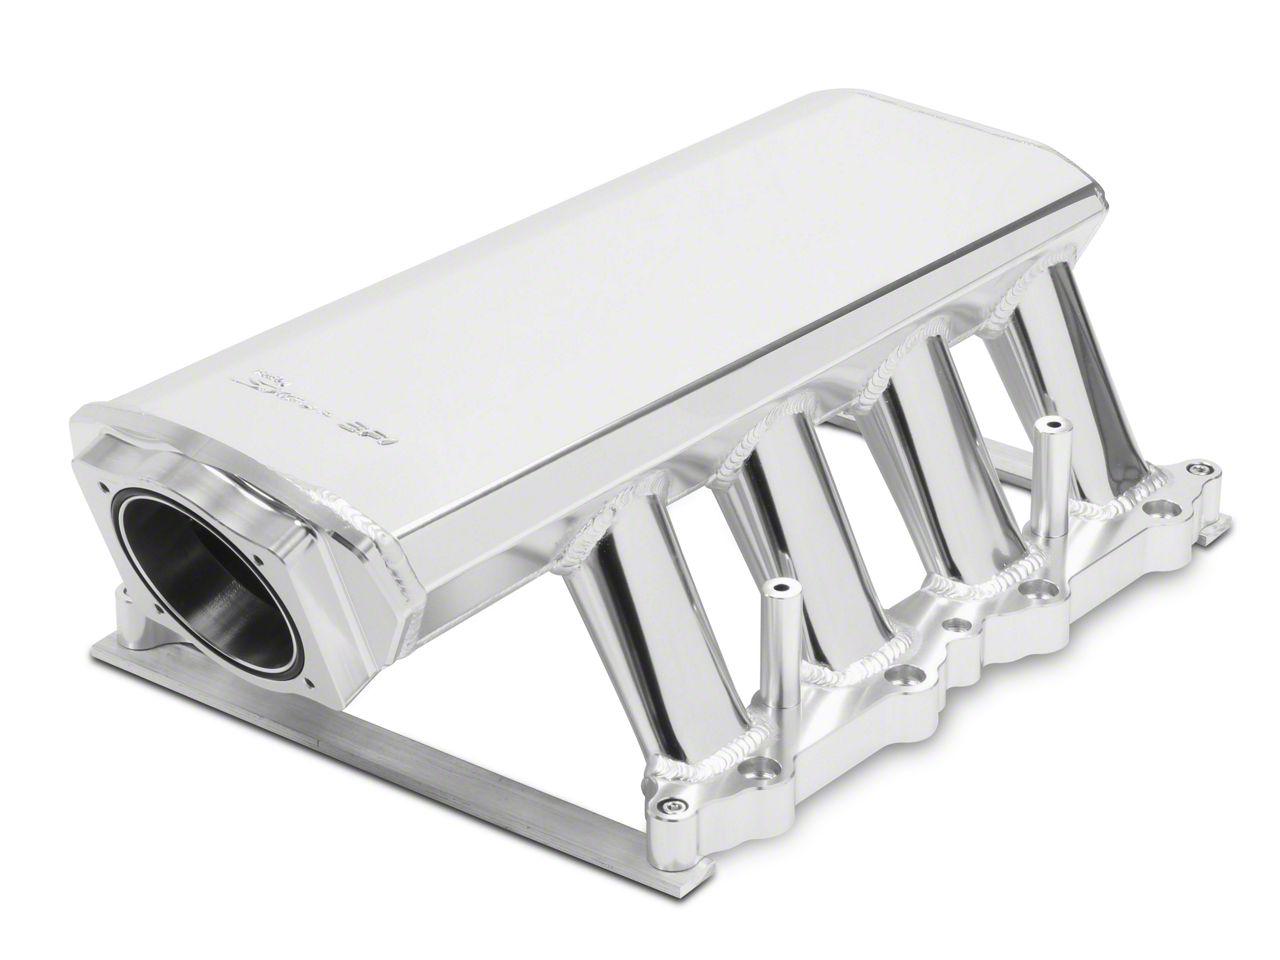 Sniper Hi-Ram EFI Fabricated Intake Manifold w/ 90mm TB Opening & Fuel Rail Kit - Silver (11-14 GT)